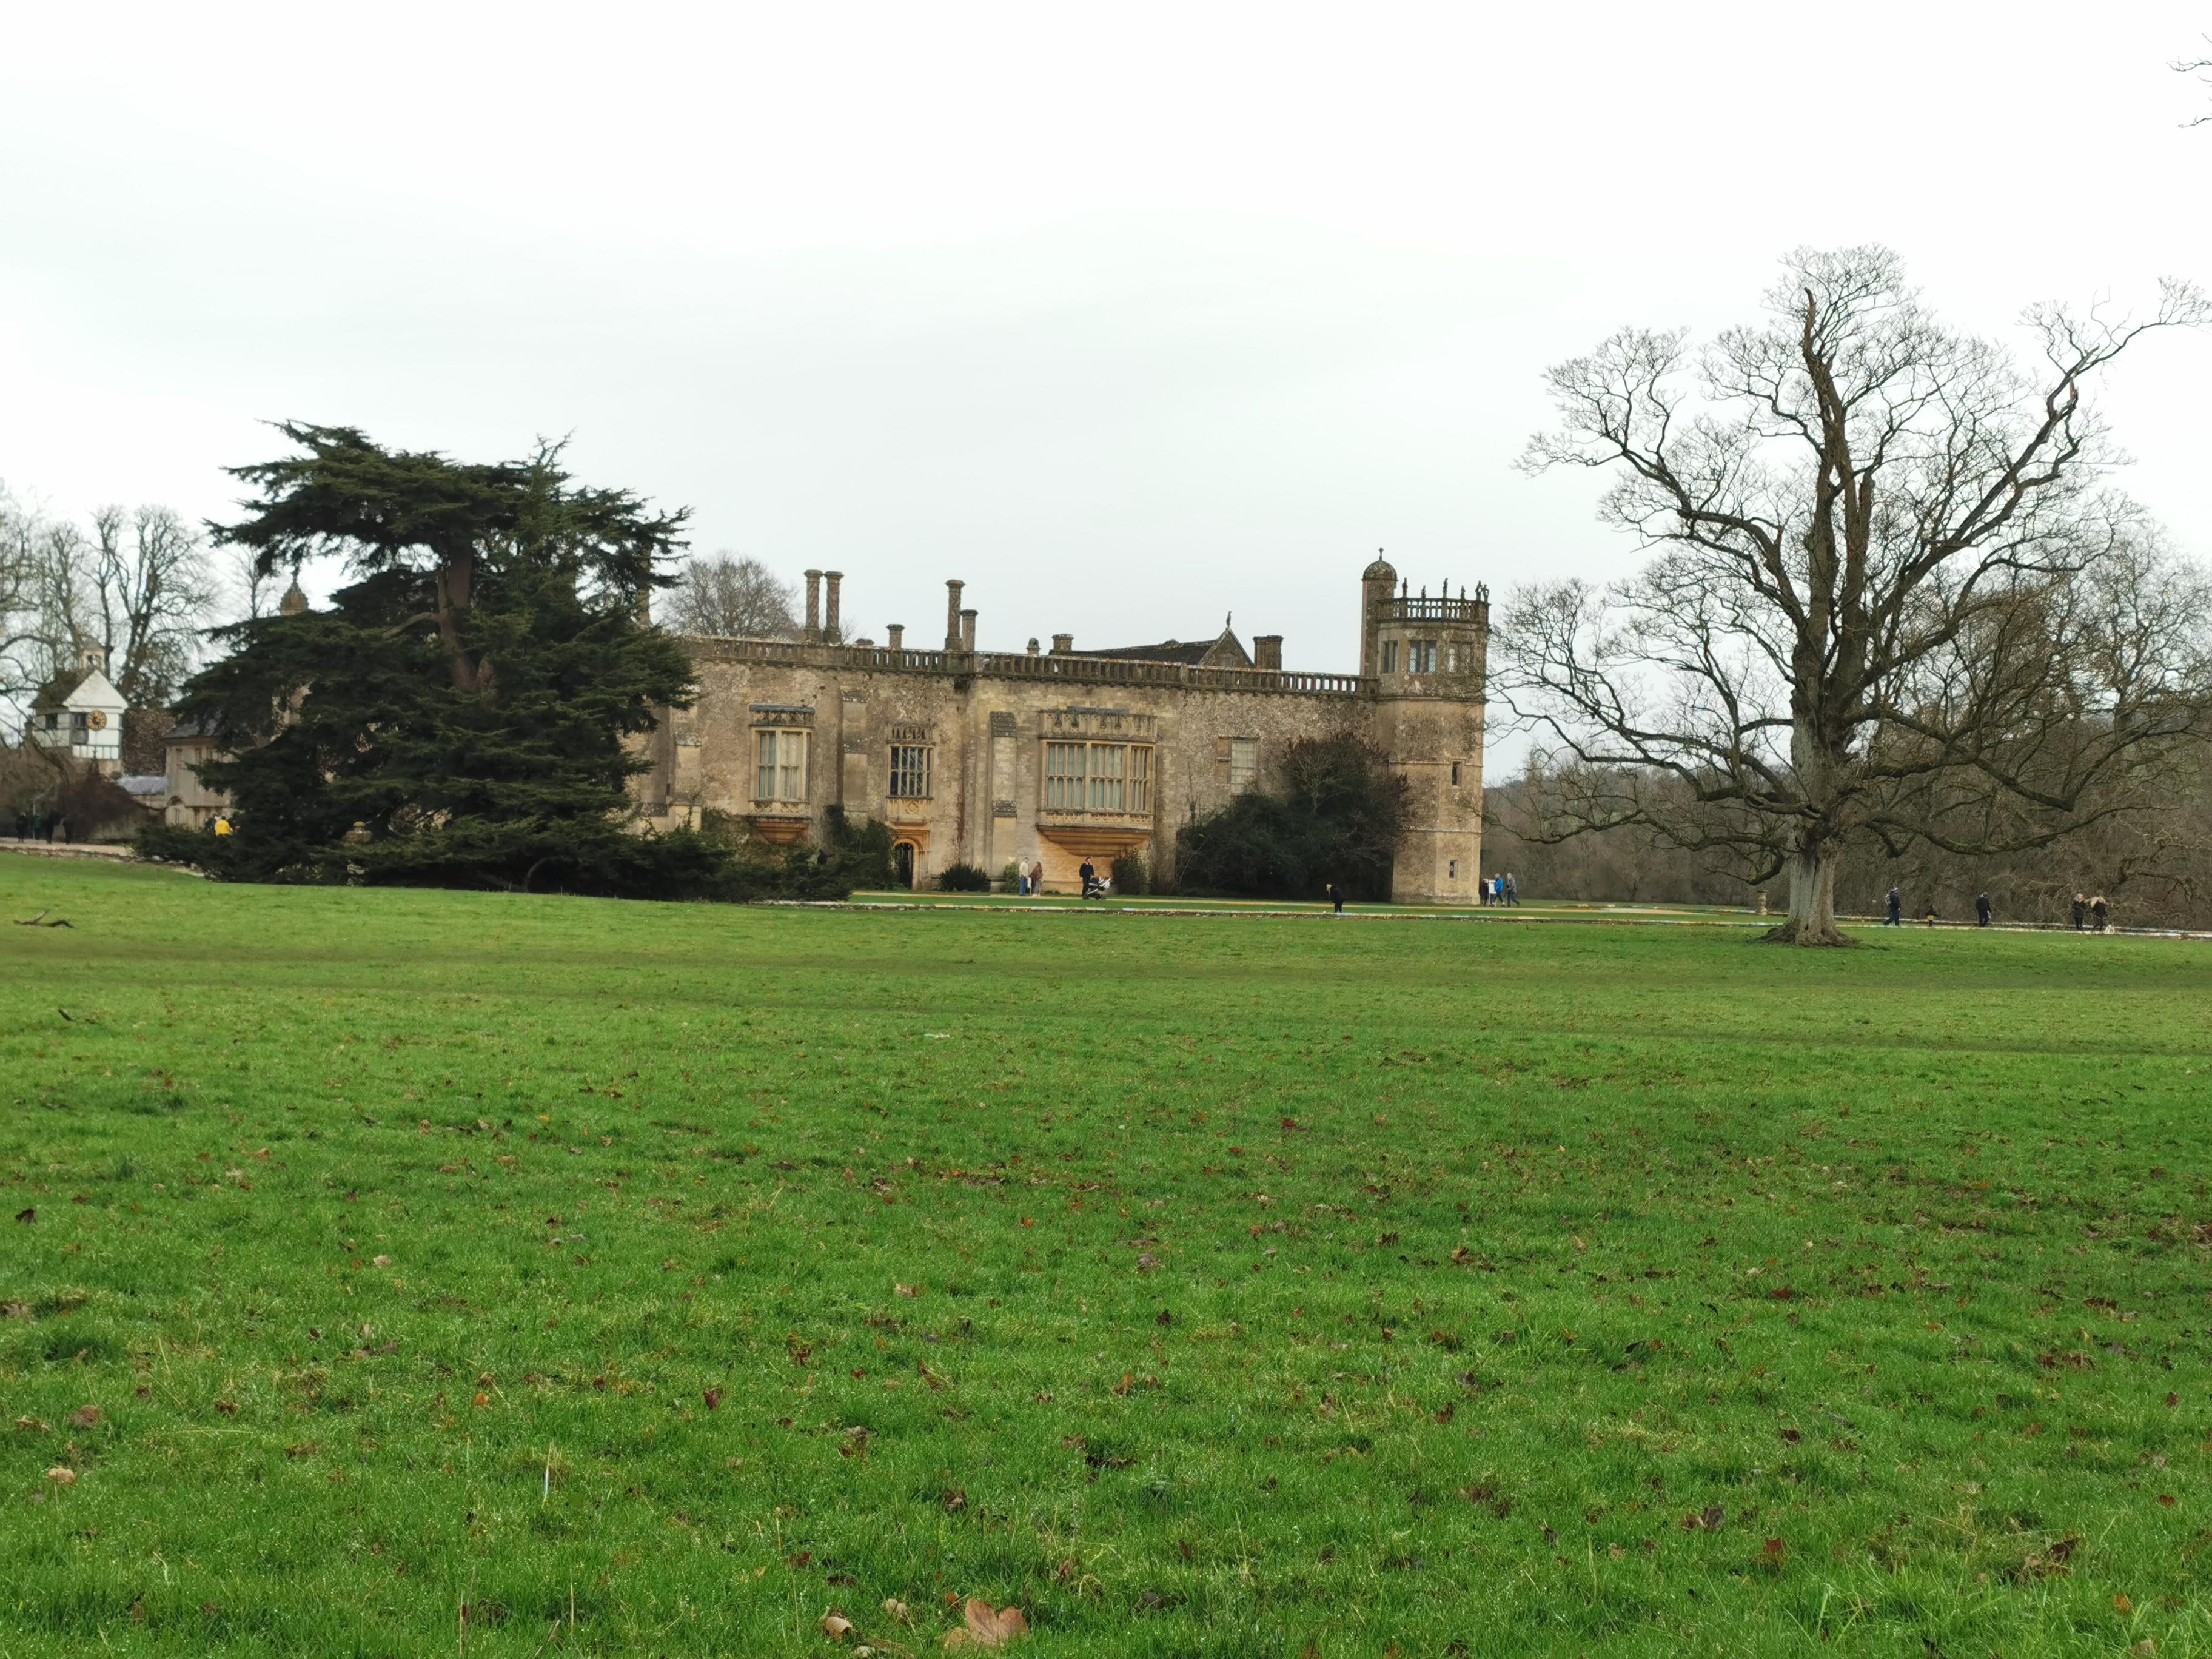 Lacock Abbey from the roadside